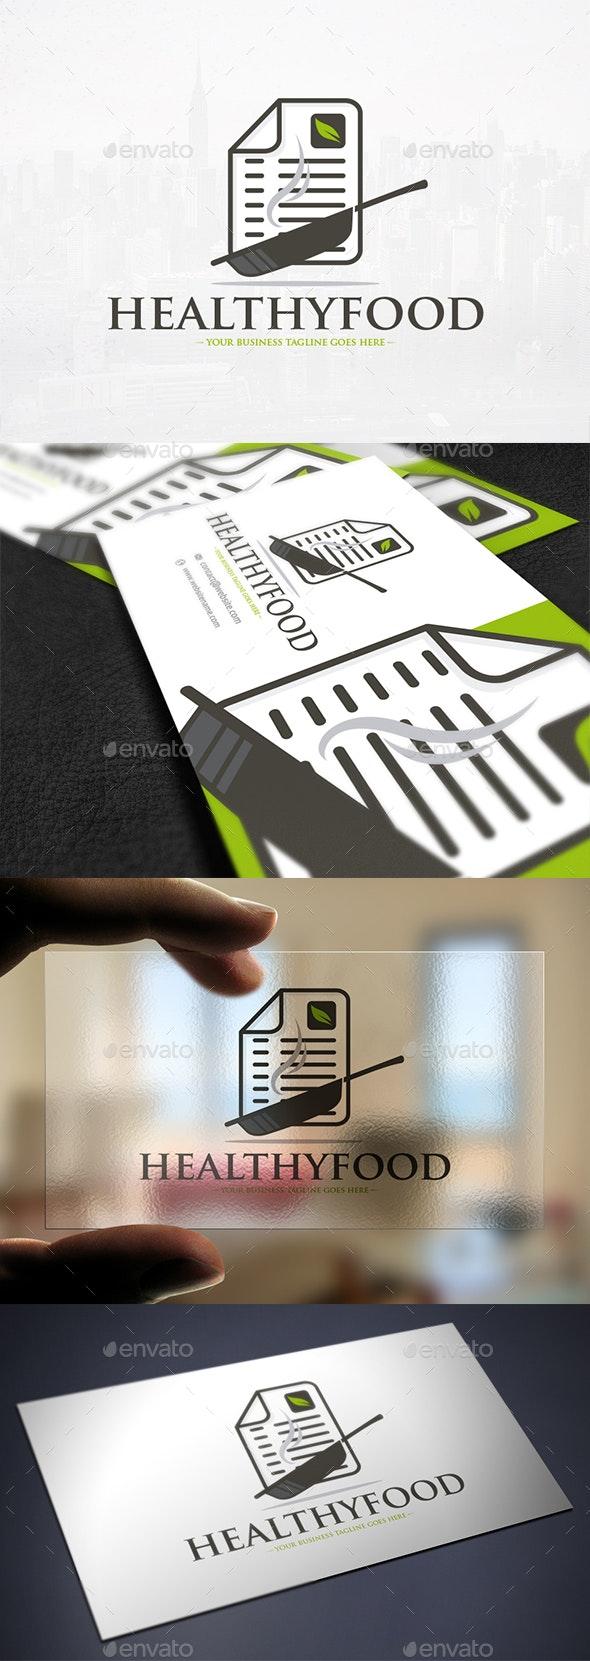 Food Recipe Blog Logo - Objects Logo Templates